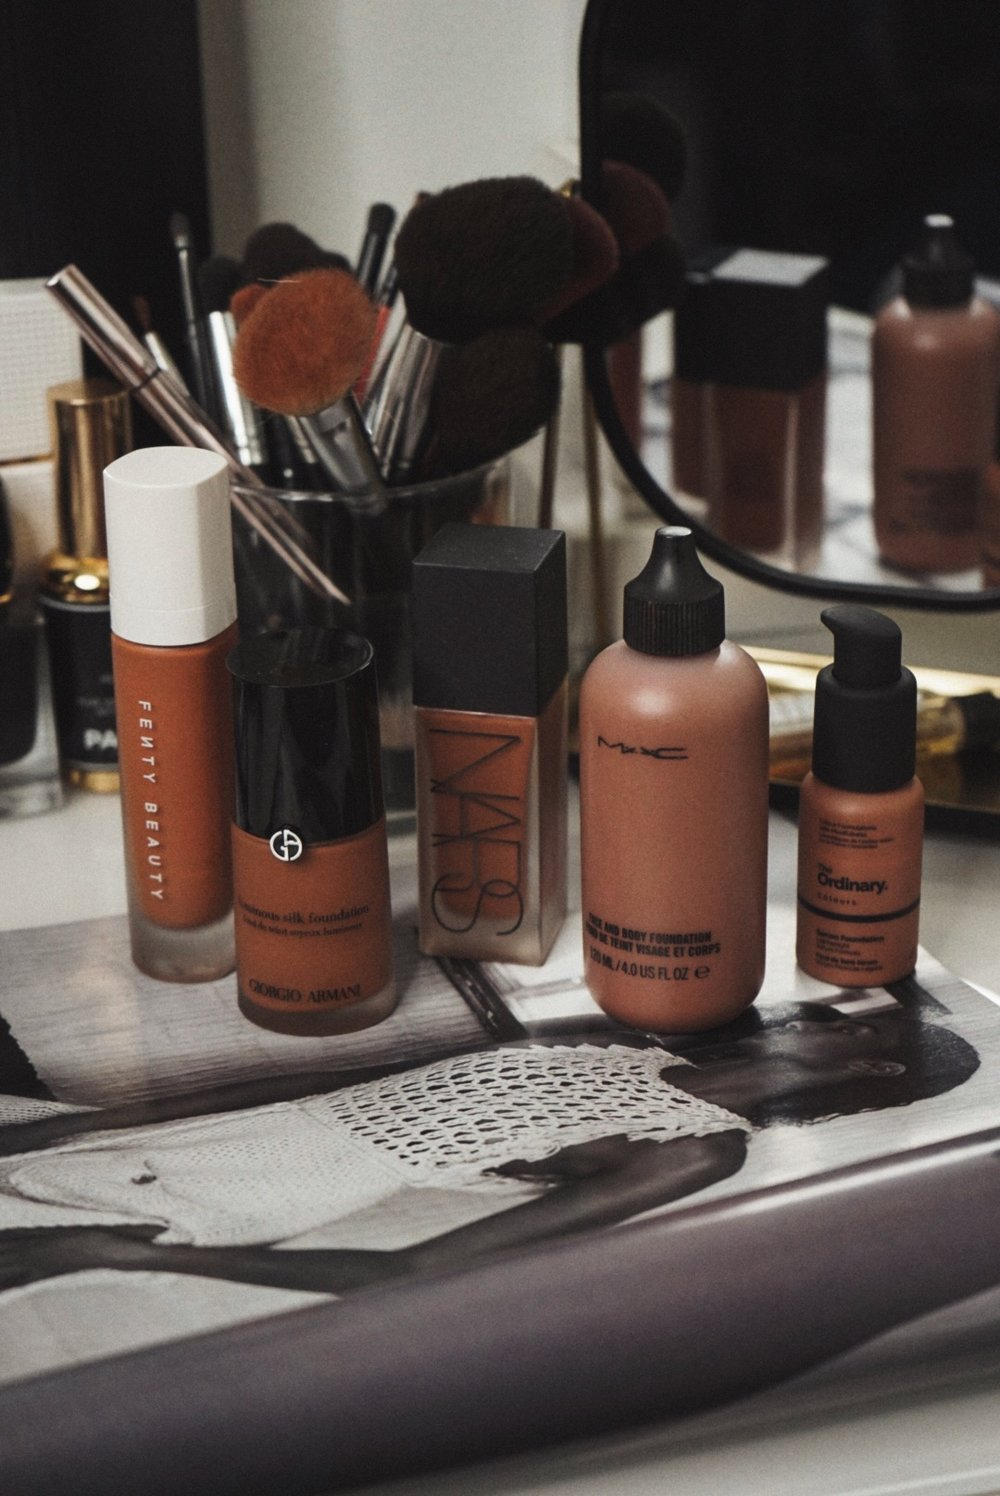 TashaJames-TheGlossier-Top-Foundations-Makeup-4.JPG